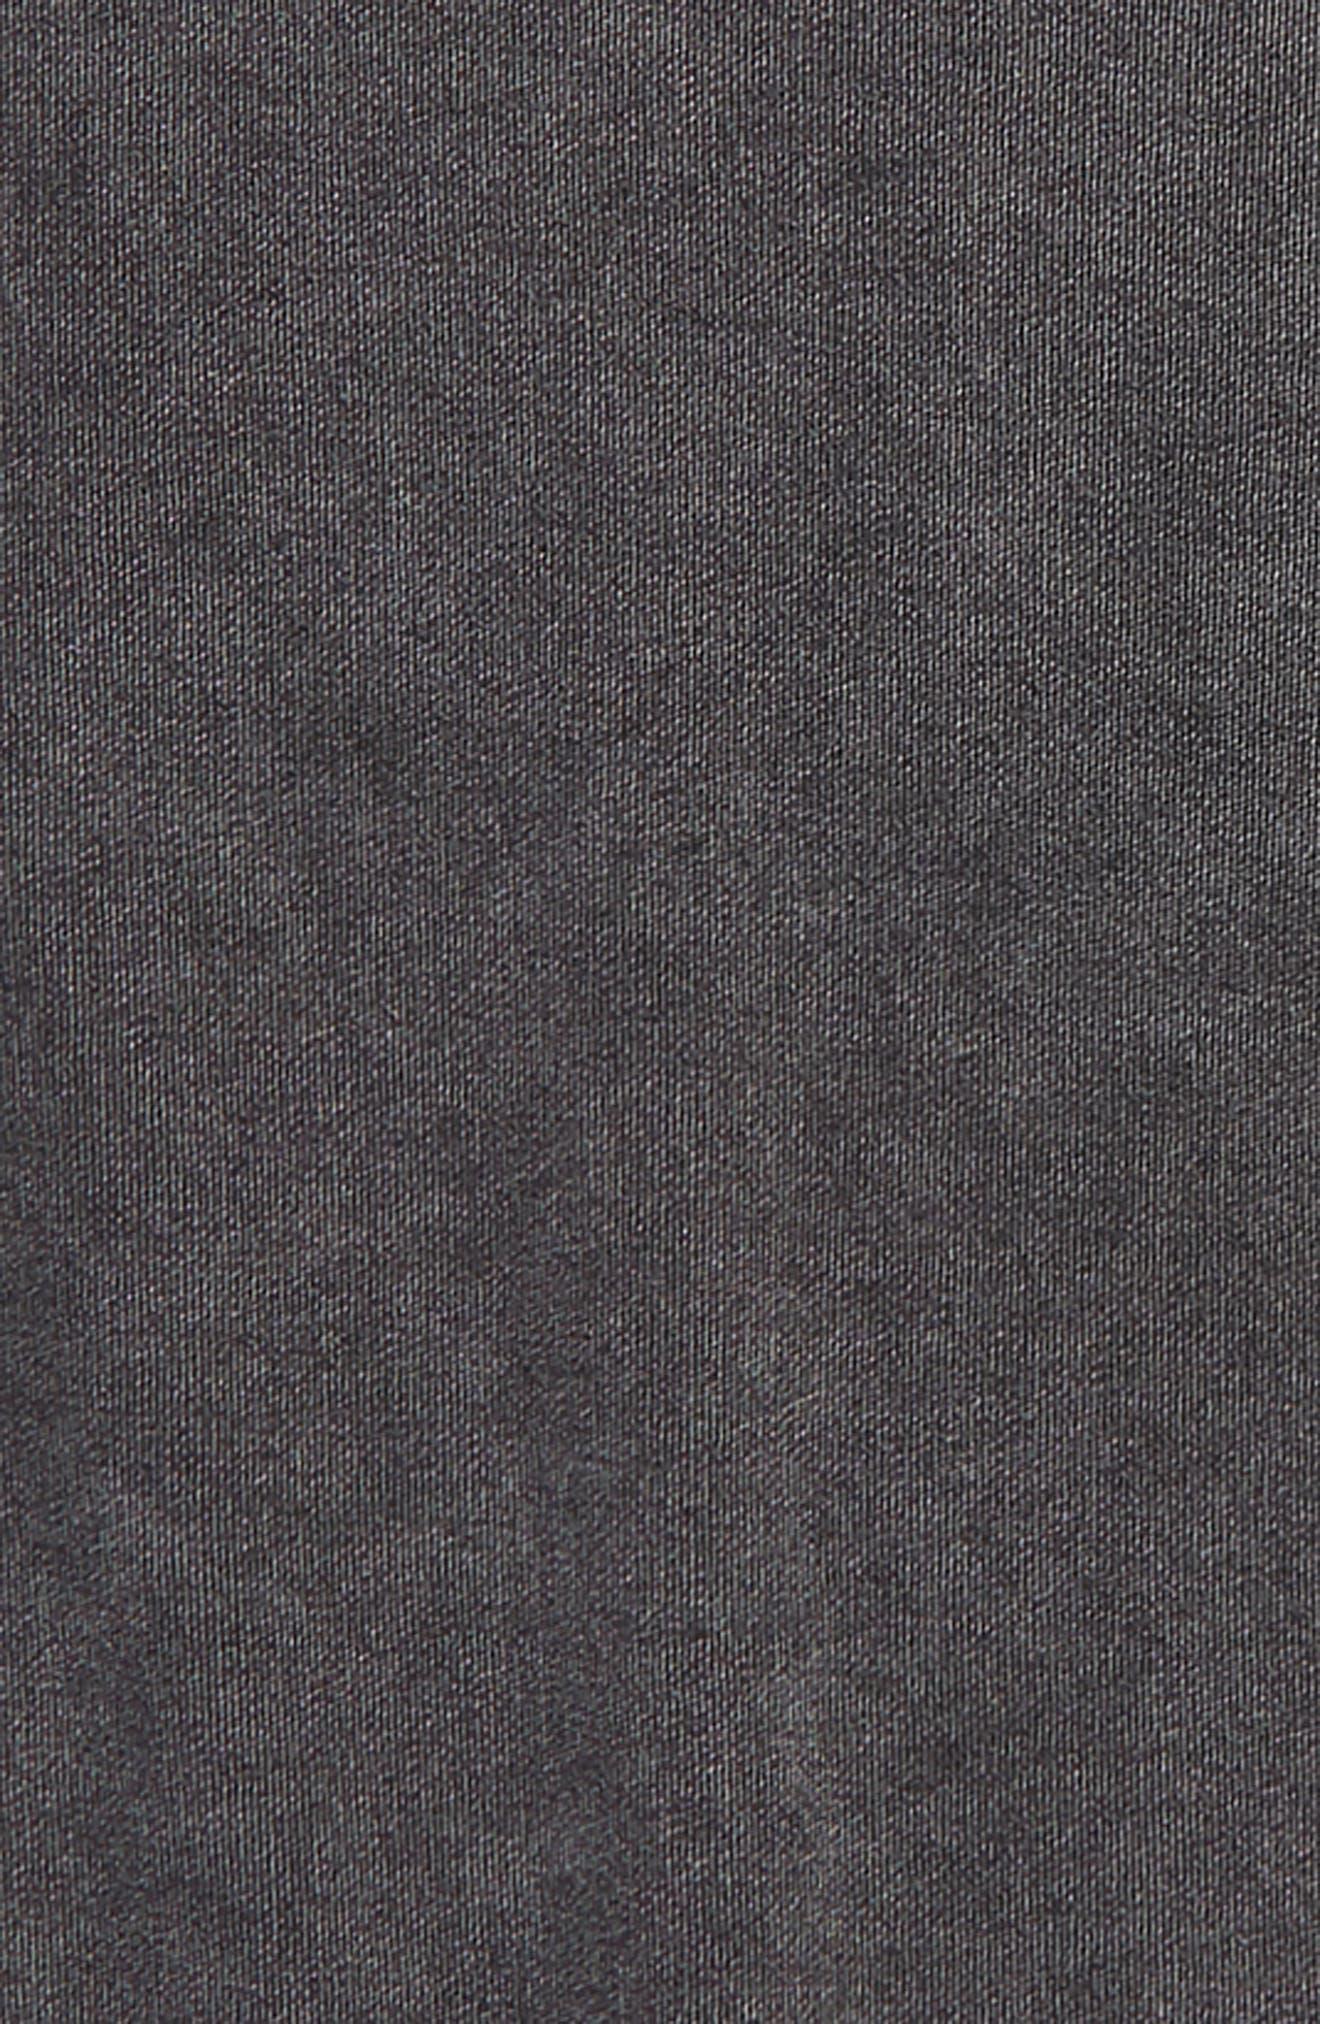 Boxy Fleece T-Shirt,                             Alternate thumbnail 2, color,                             Black Wash